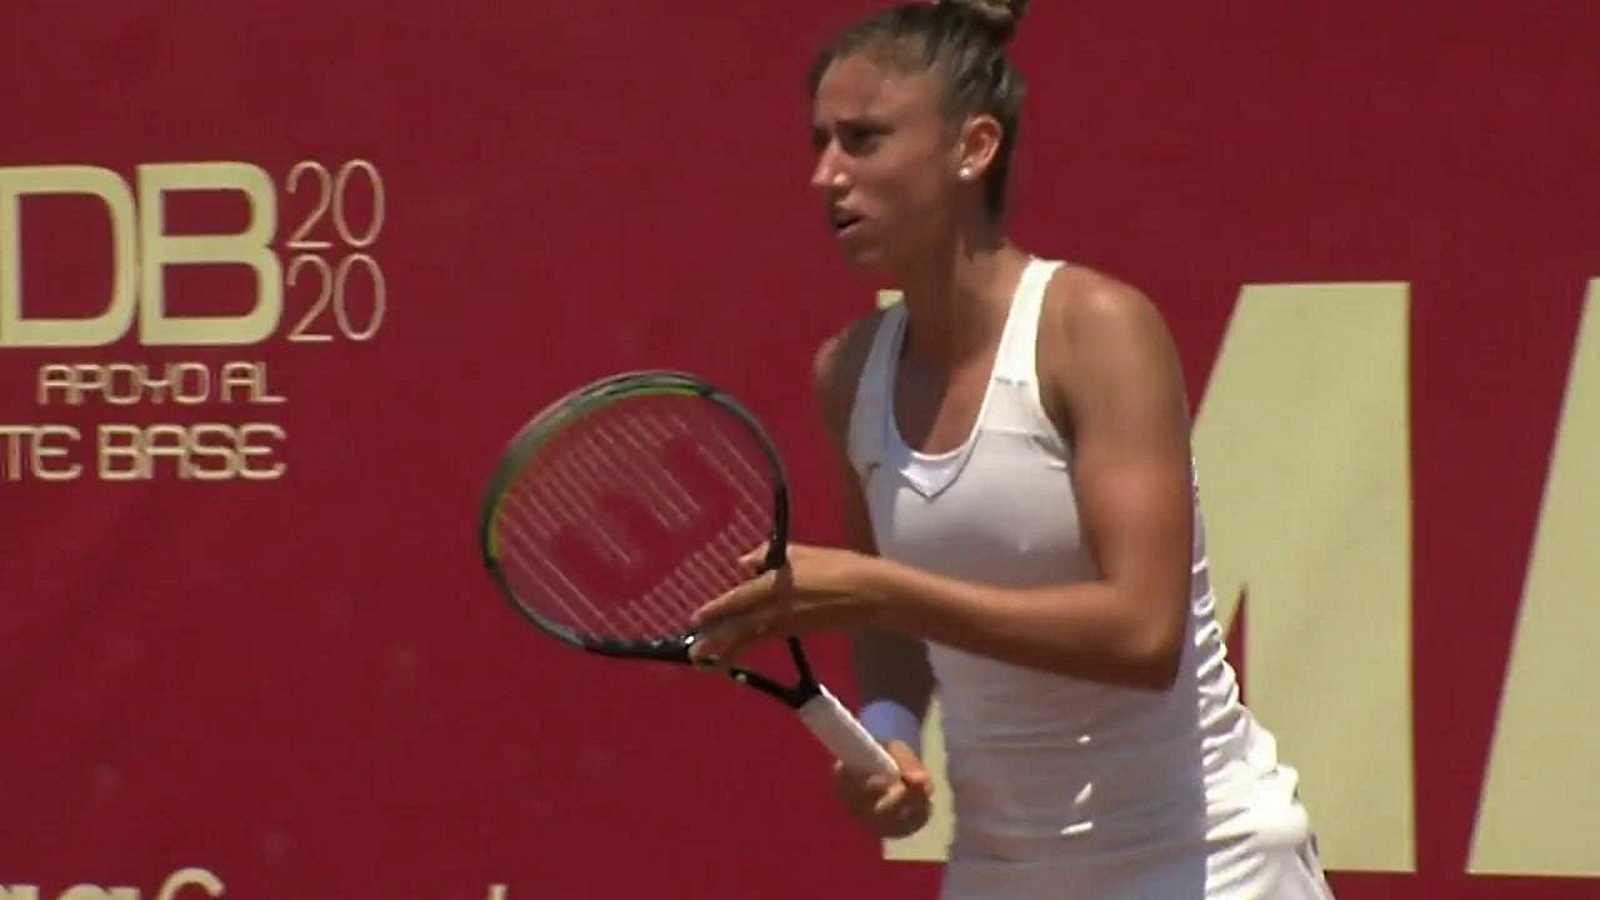 Tenis - Liga Mapfre de tenis femenino. 2ª Semifinal. Desde Castellón - ver ahora